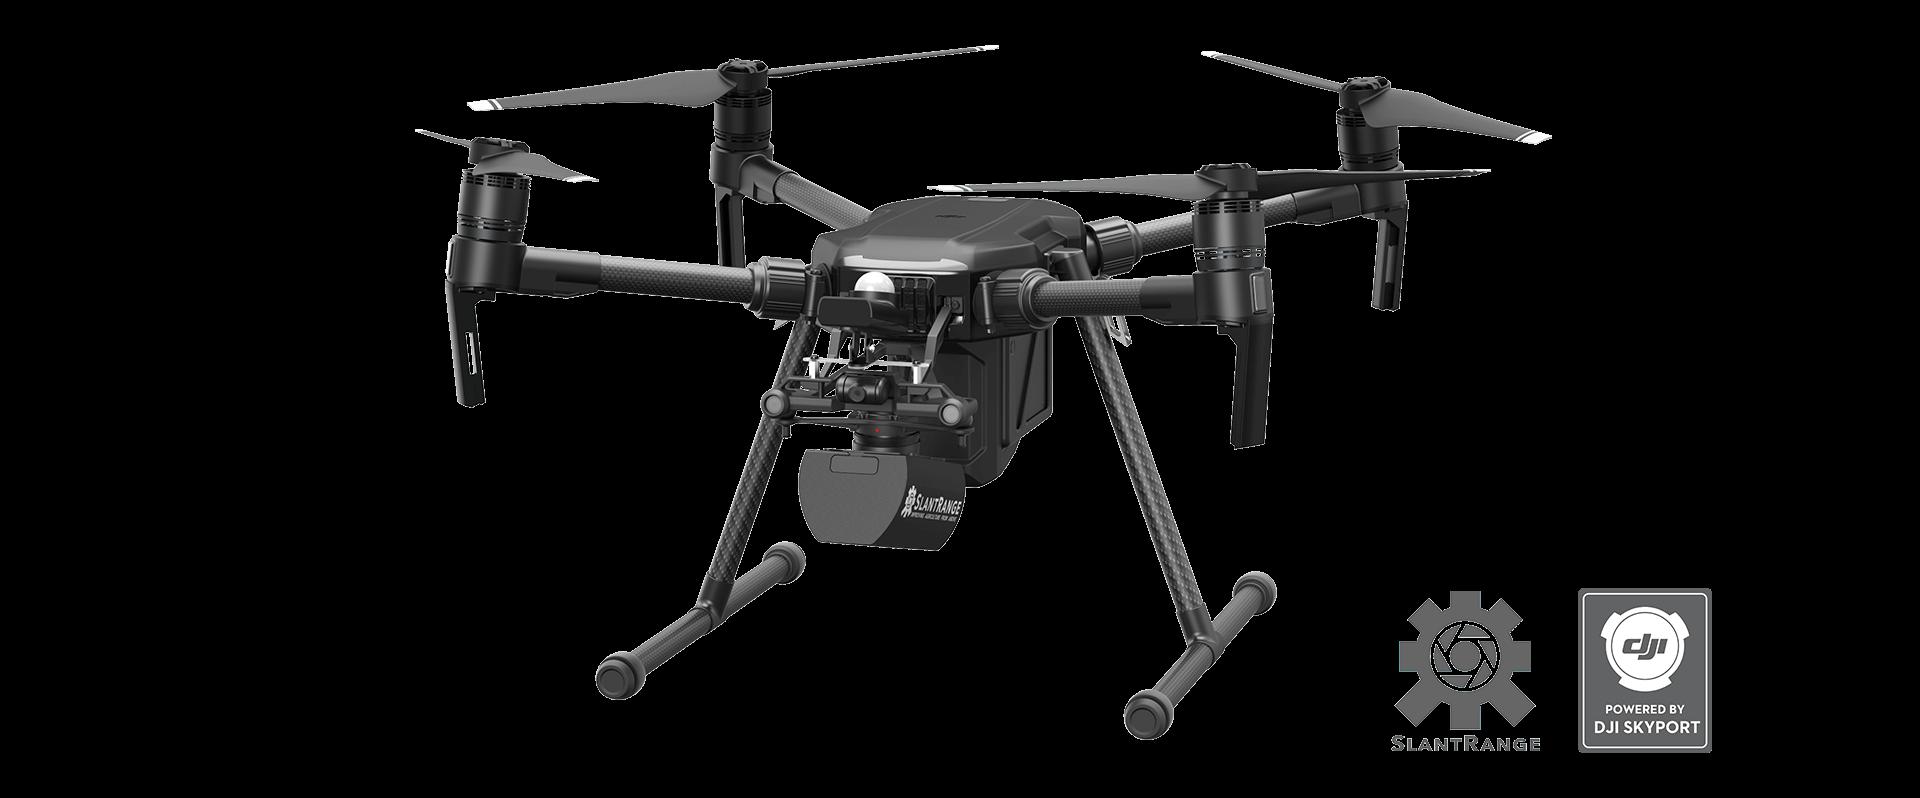 Slantrange Announces The 3px For Dji Matrice 200 Series Drones